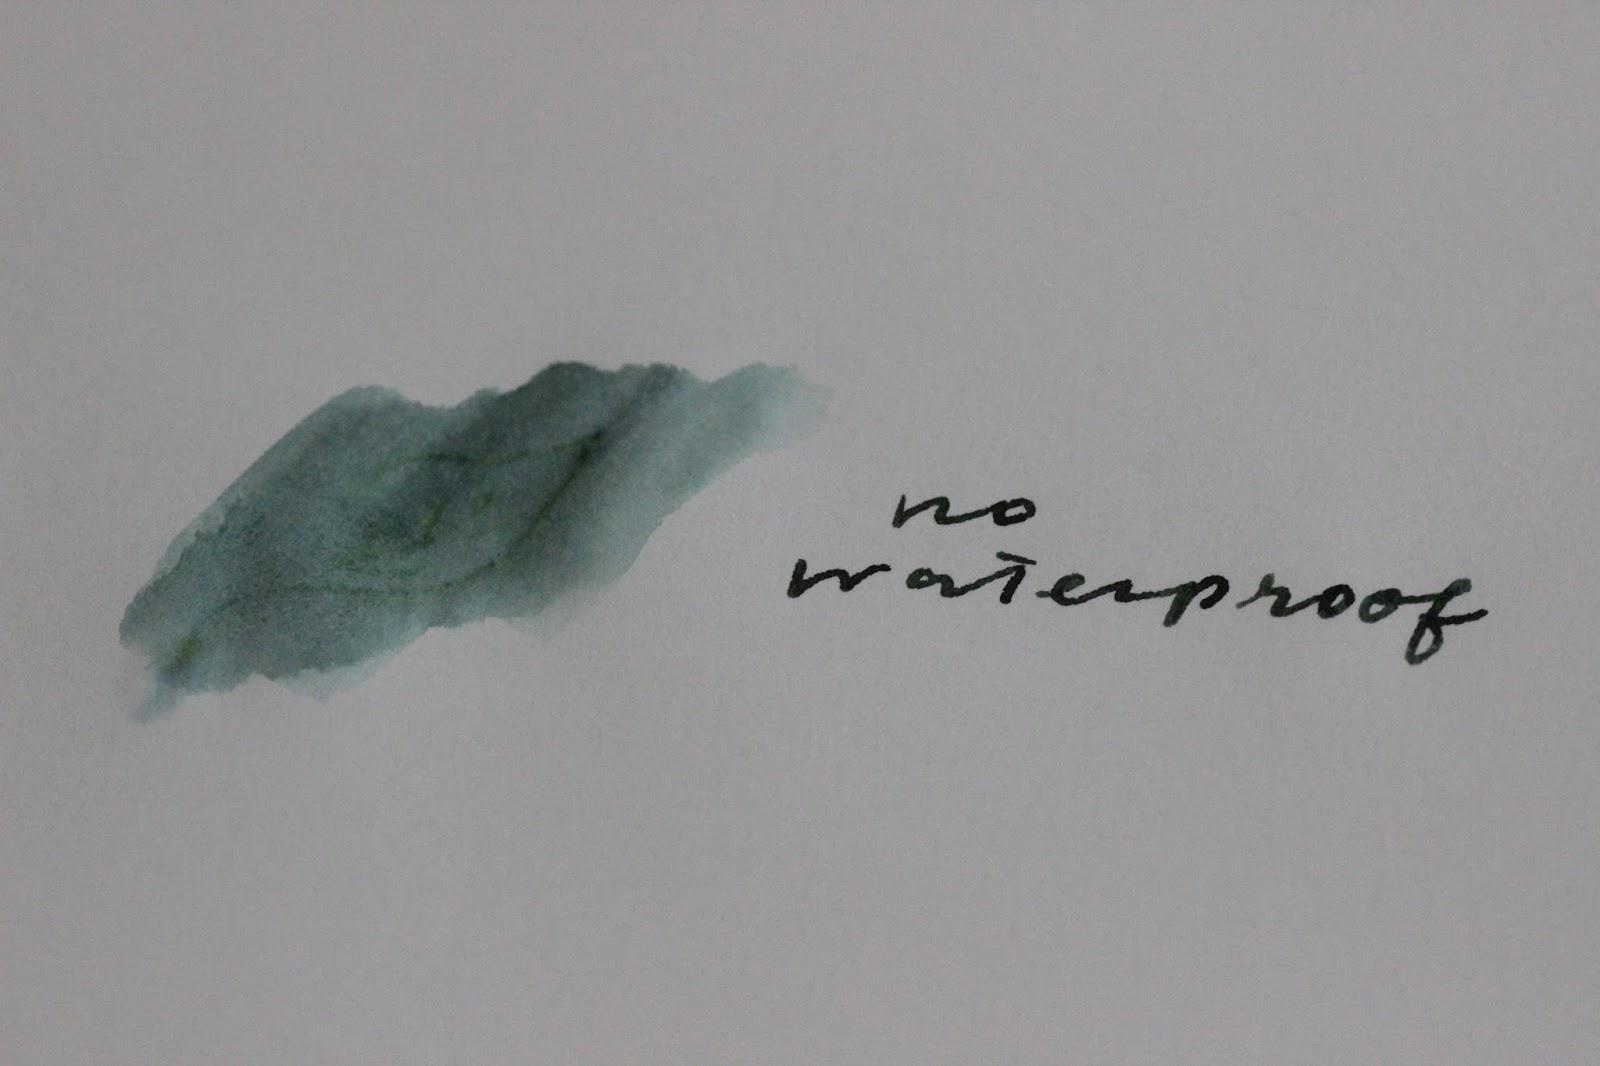 Diamine Evergreen Ink Write To Me Often